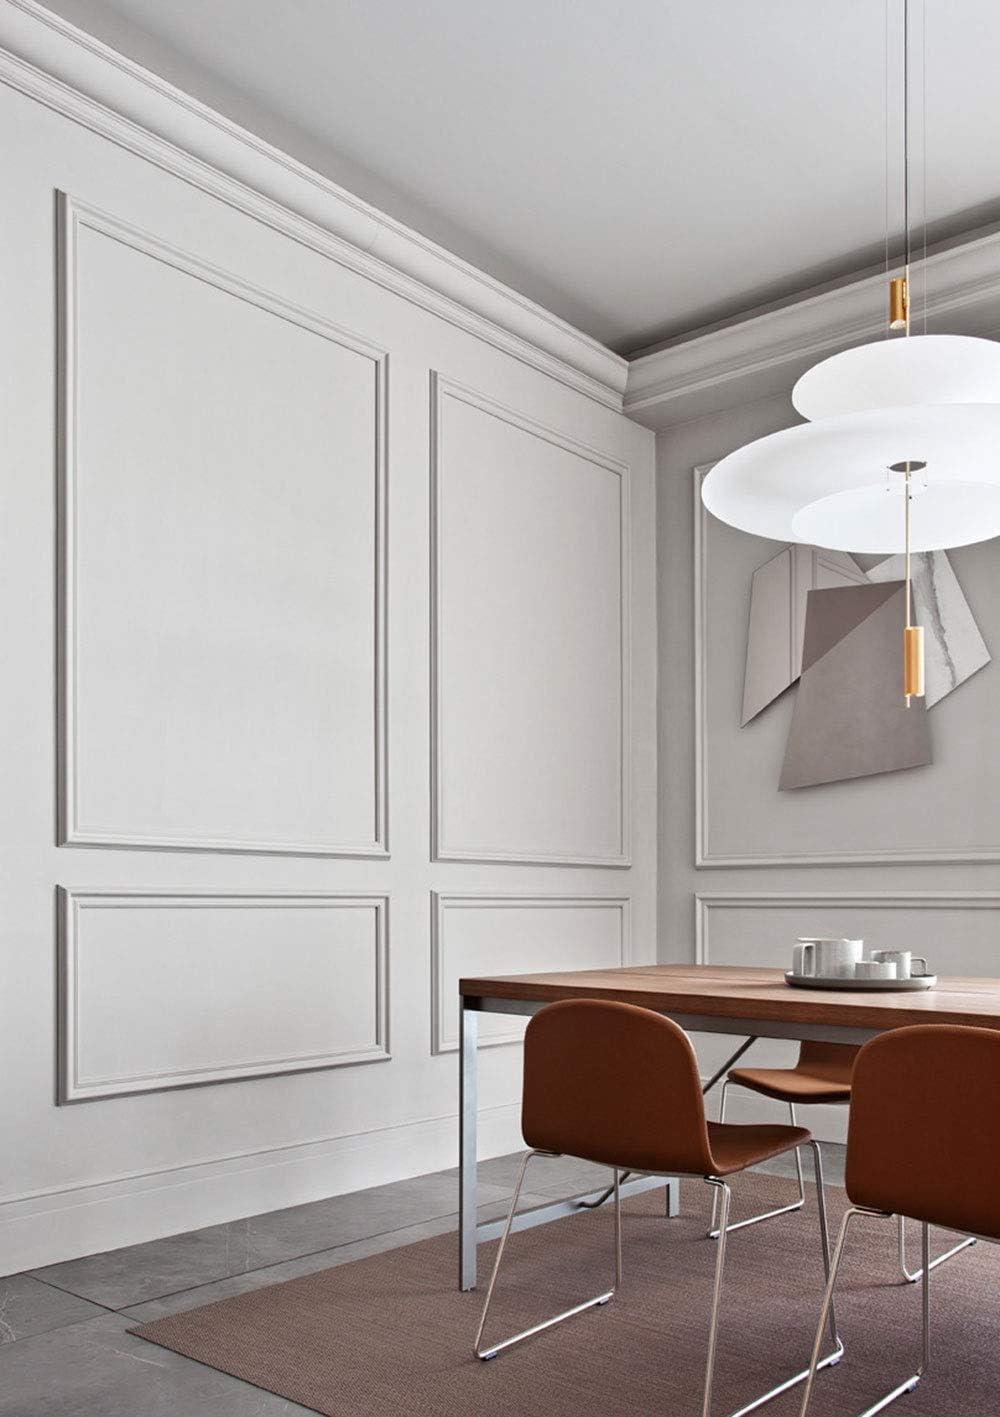 Height Orac Decor High Density Polyurethane Panel//Chair Rail//Wainscot Moulding Primed White 2-3//8 Length 78